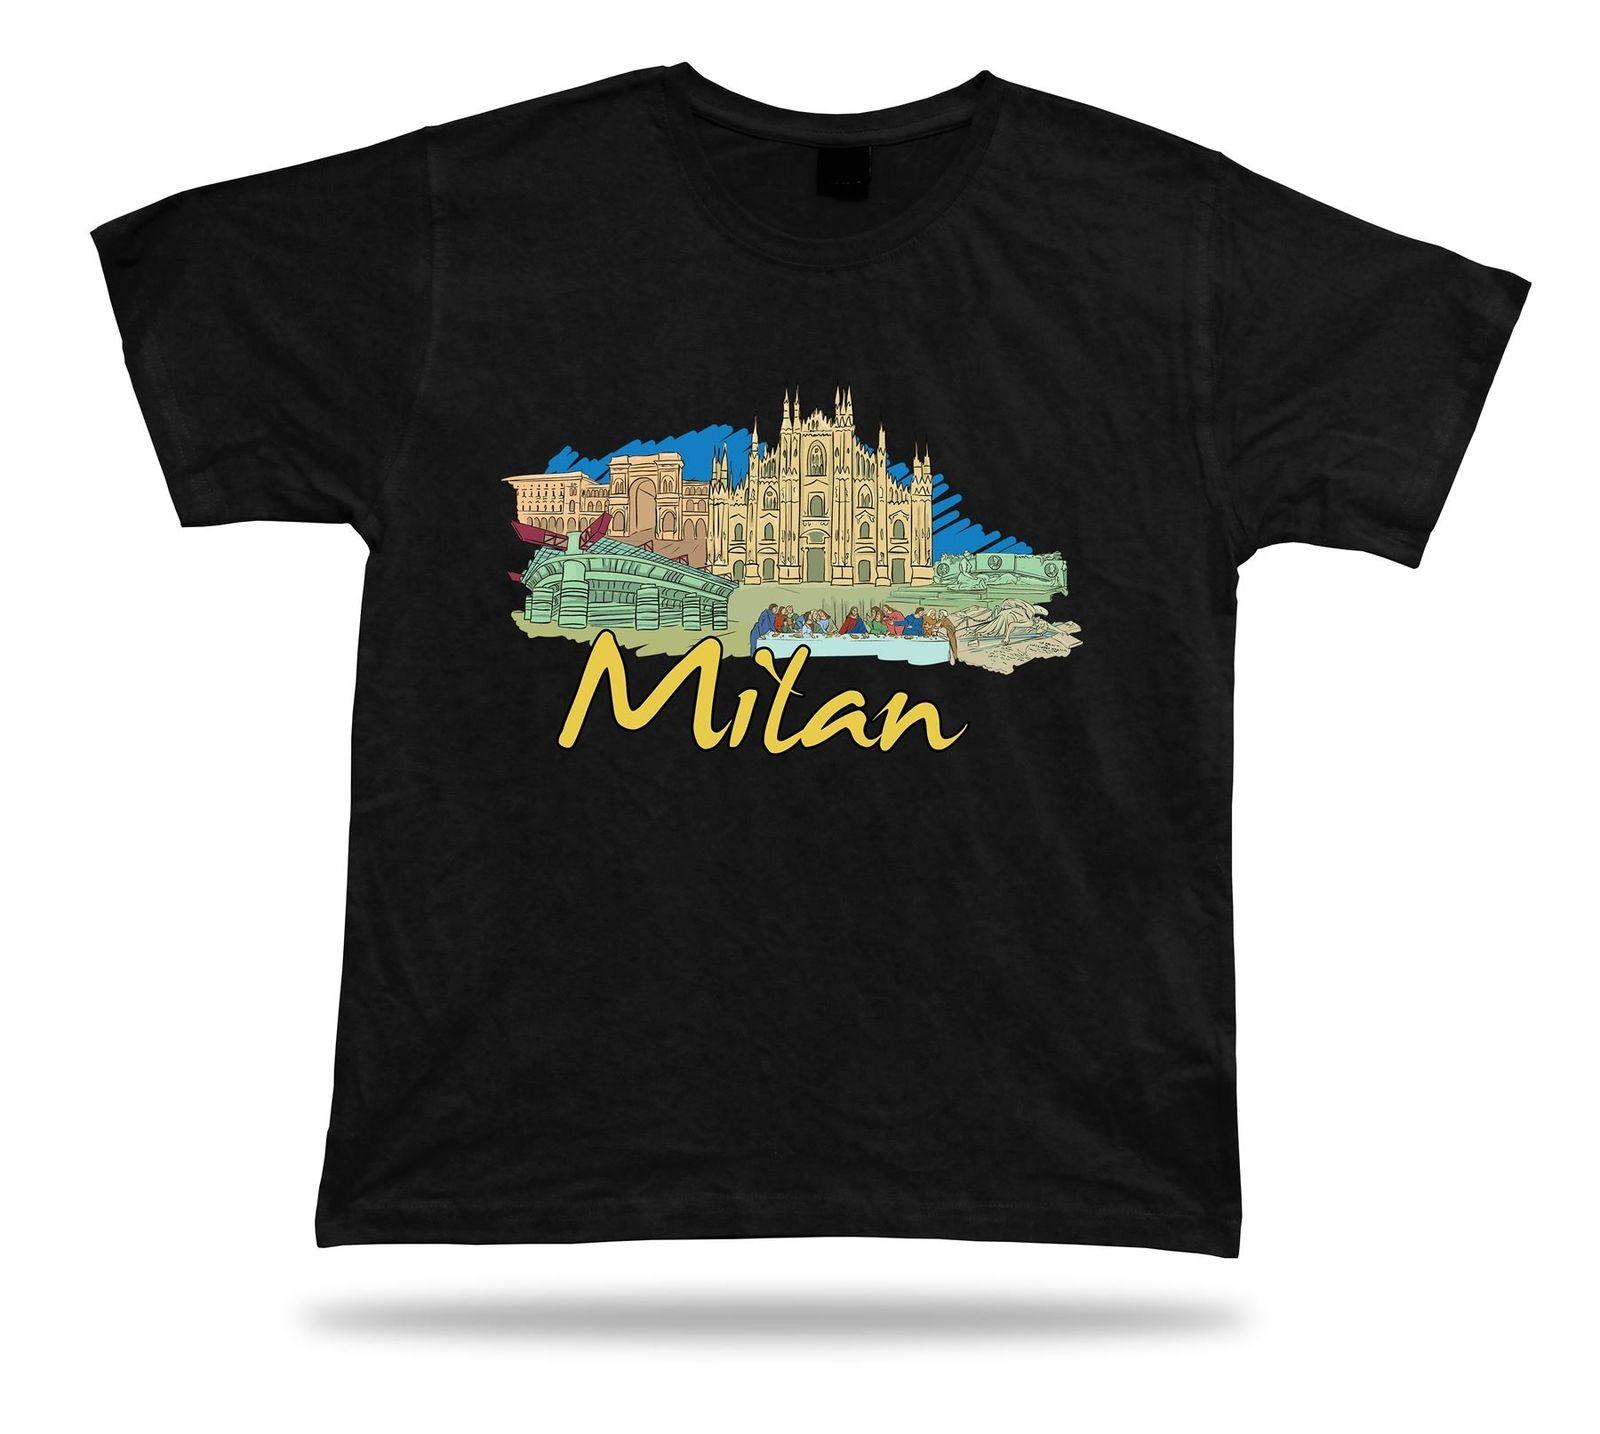 Milan Cathedral Cenacolo Vinciano Galleria Vittorio Emanuele II tee t-shirt gift